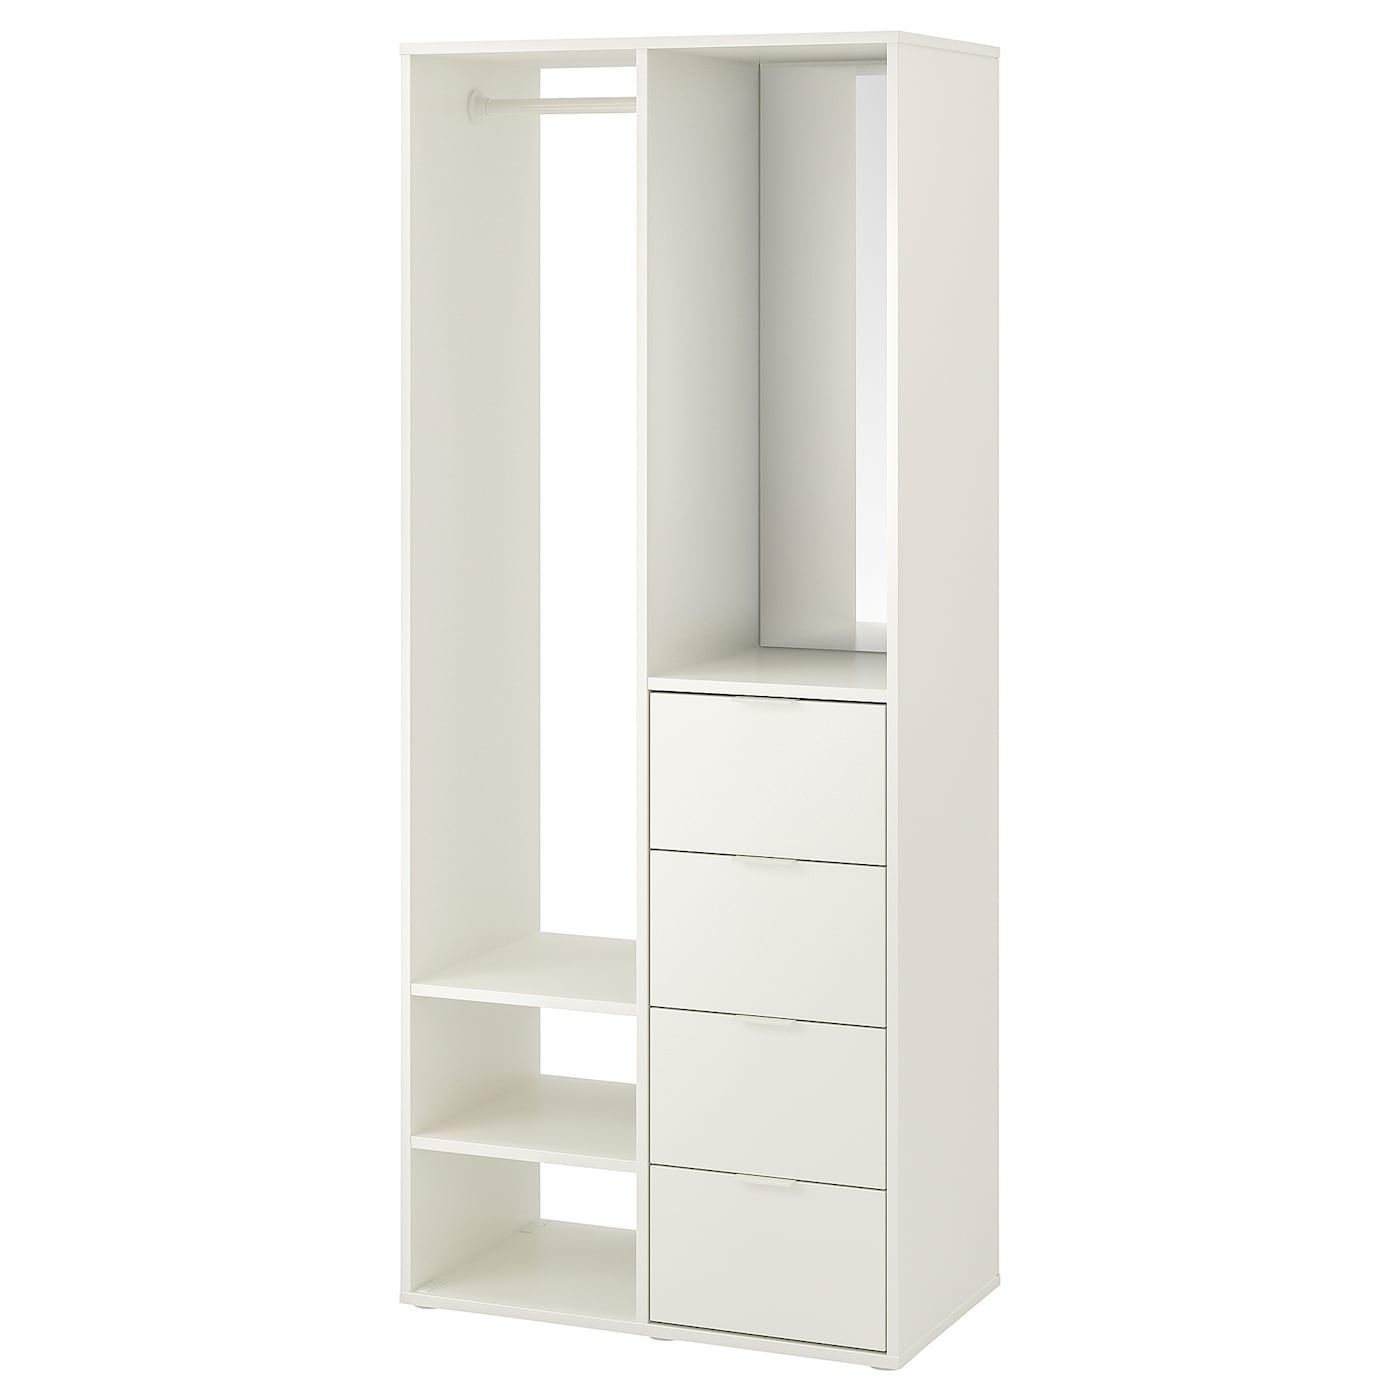 Sundlandet Open Wardrobe White 31 1 8x17 3 8x73 5 8 Ikea Open Wardrobe Ikea Clothes Rail